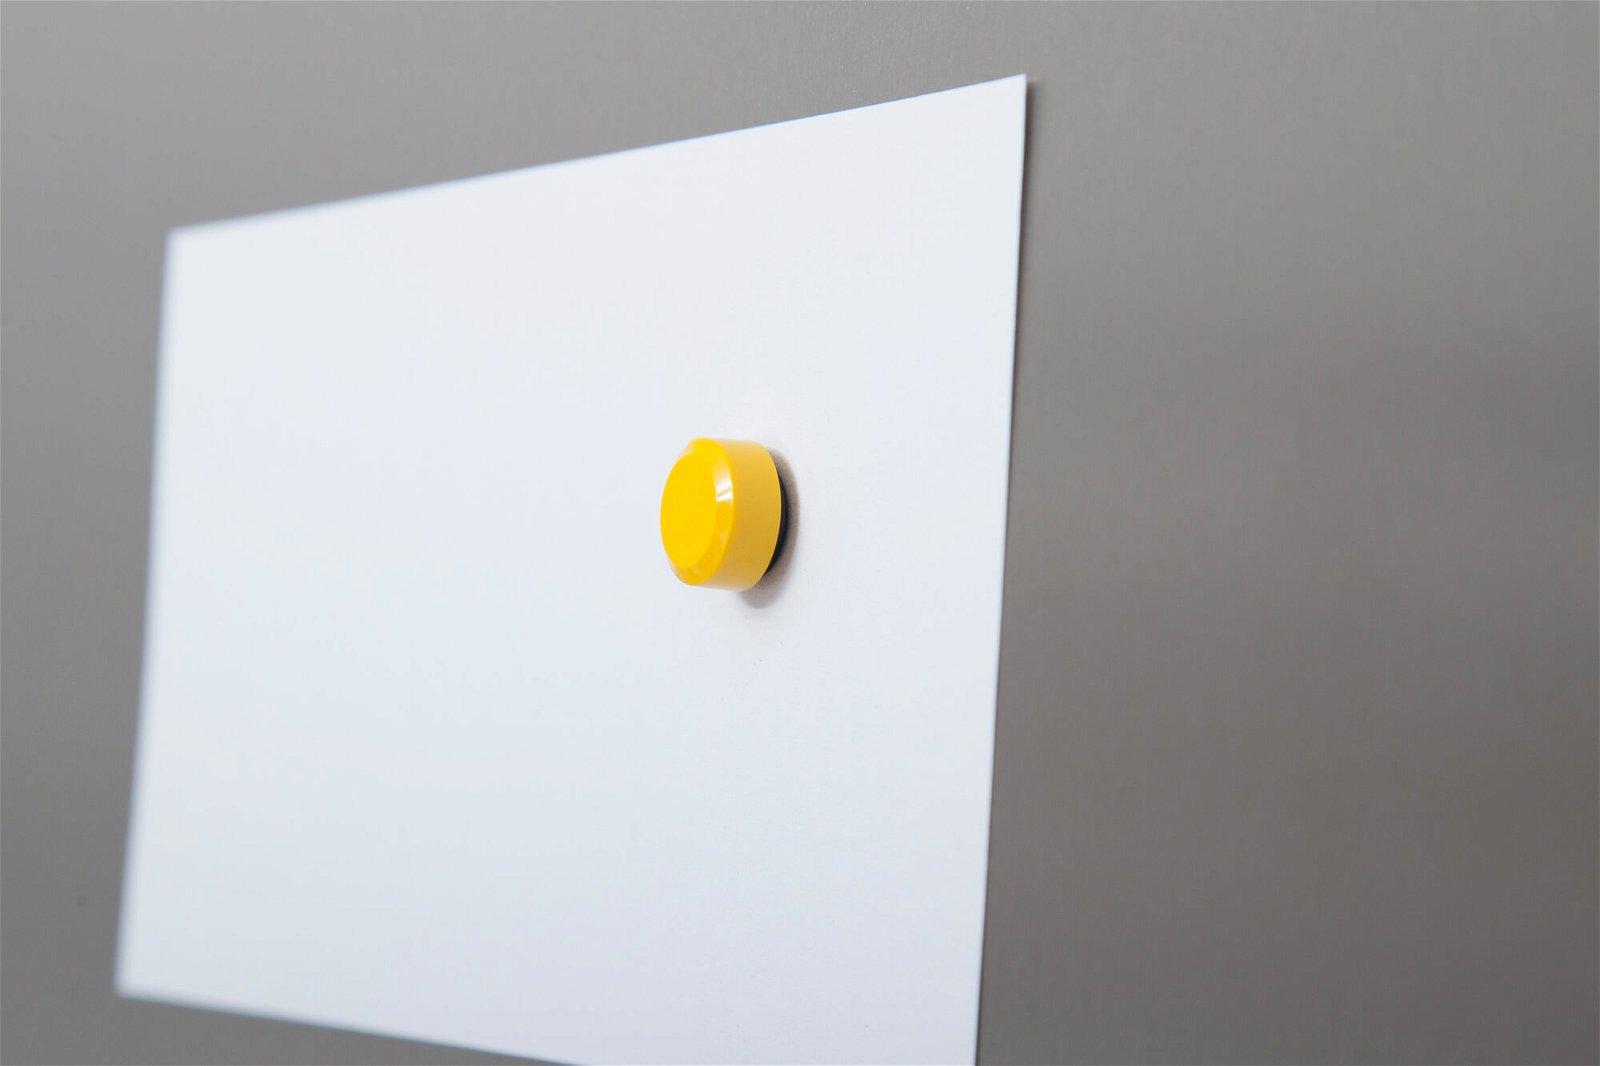 Facetterand-Magnet MAULpro Ø 15 mm, 0,17 kg, 20 St./Set, gelb